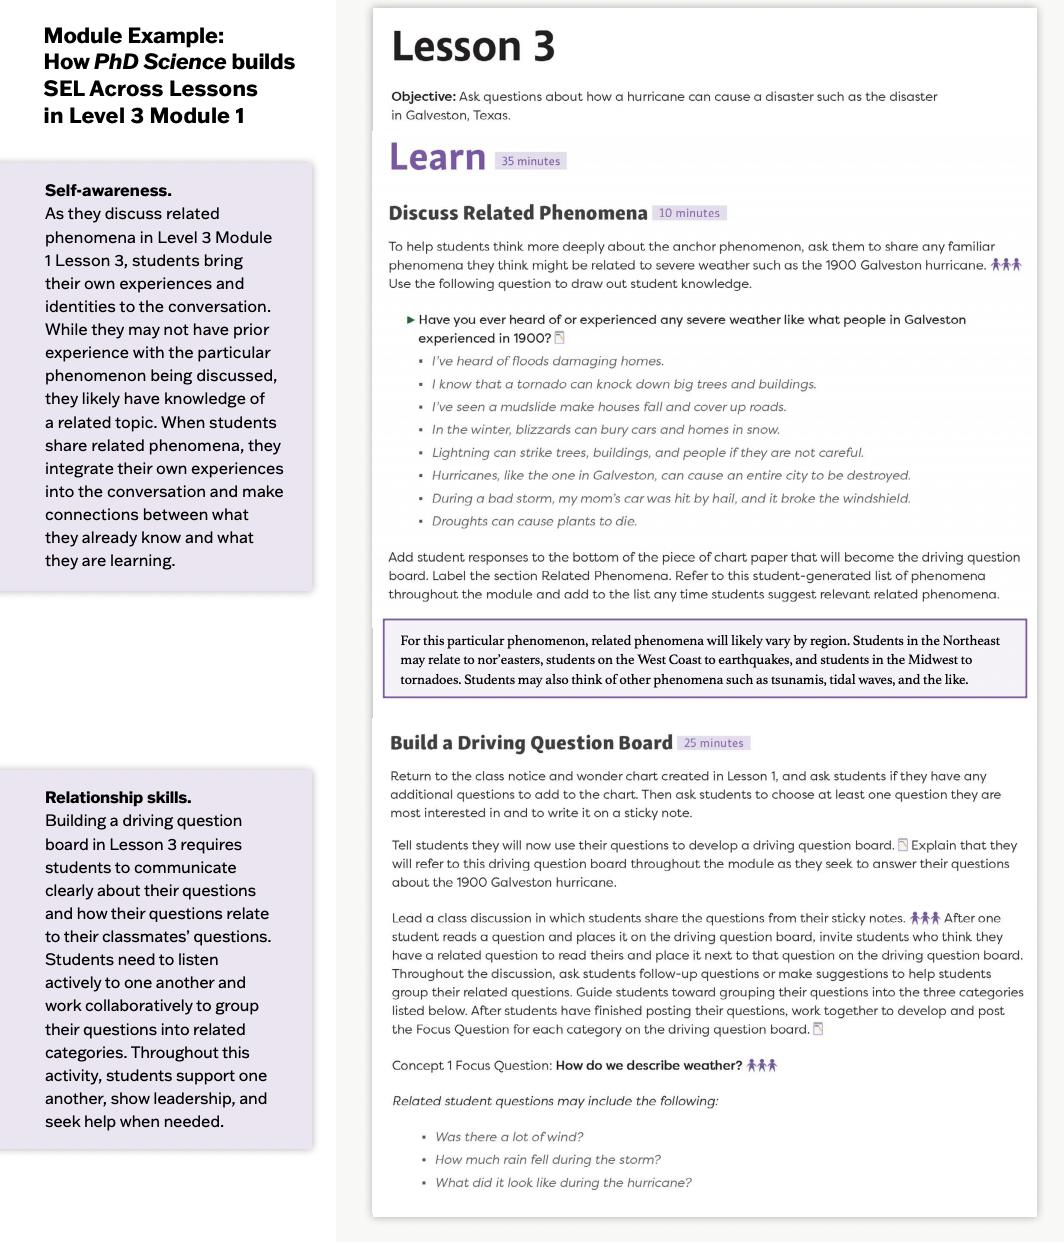 PhDScience_SEL_Lesson3